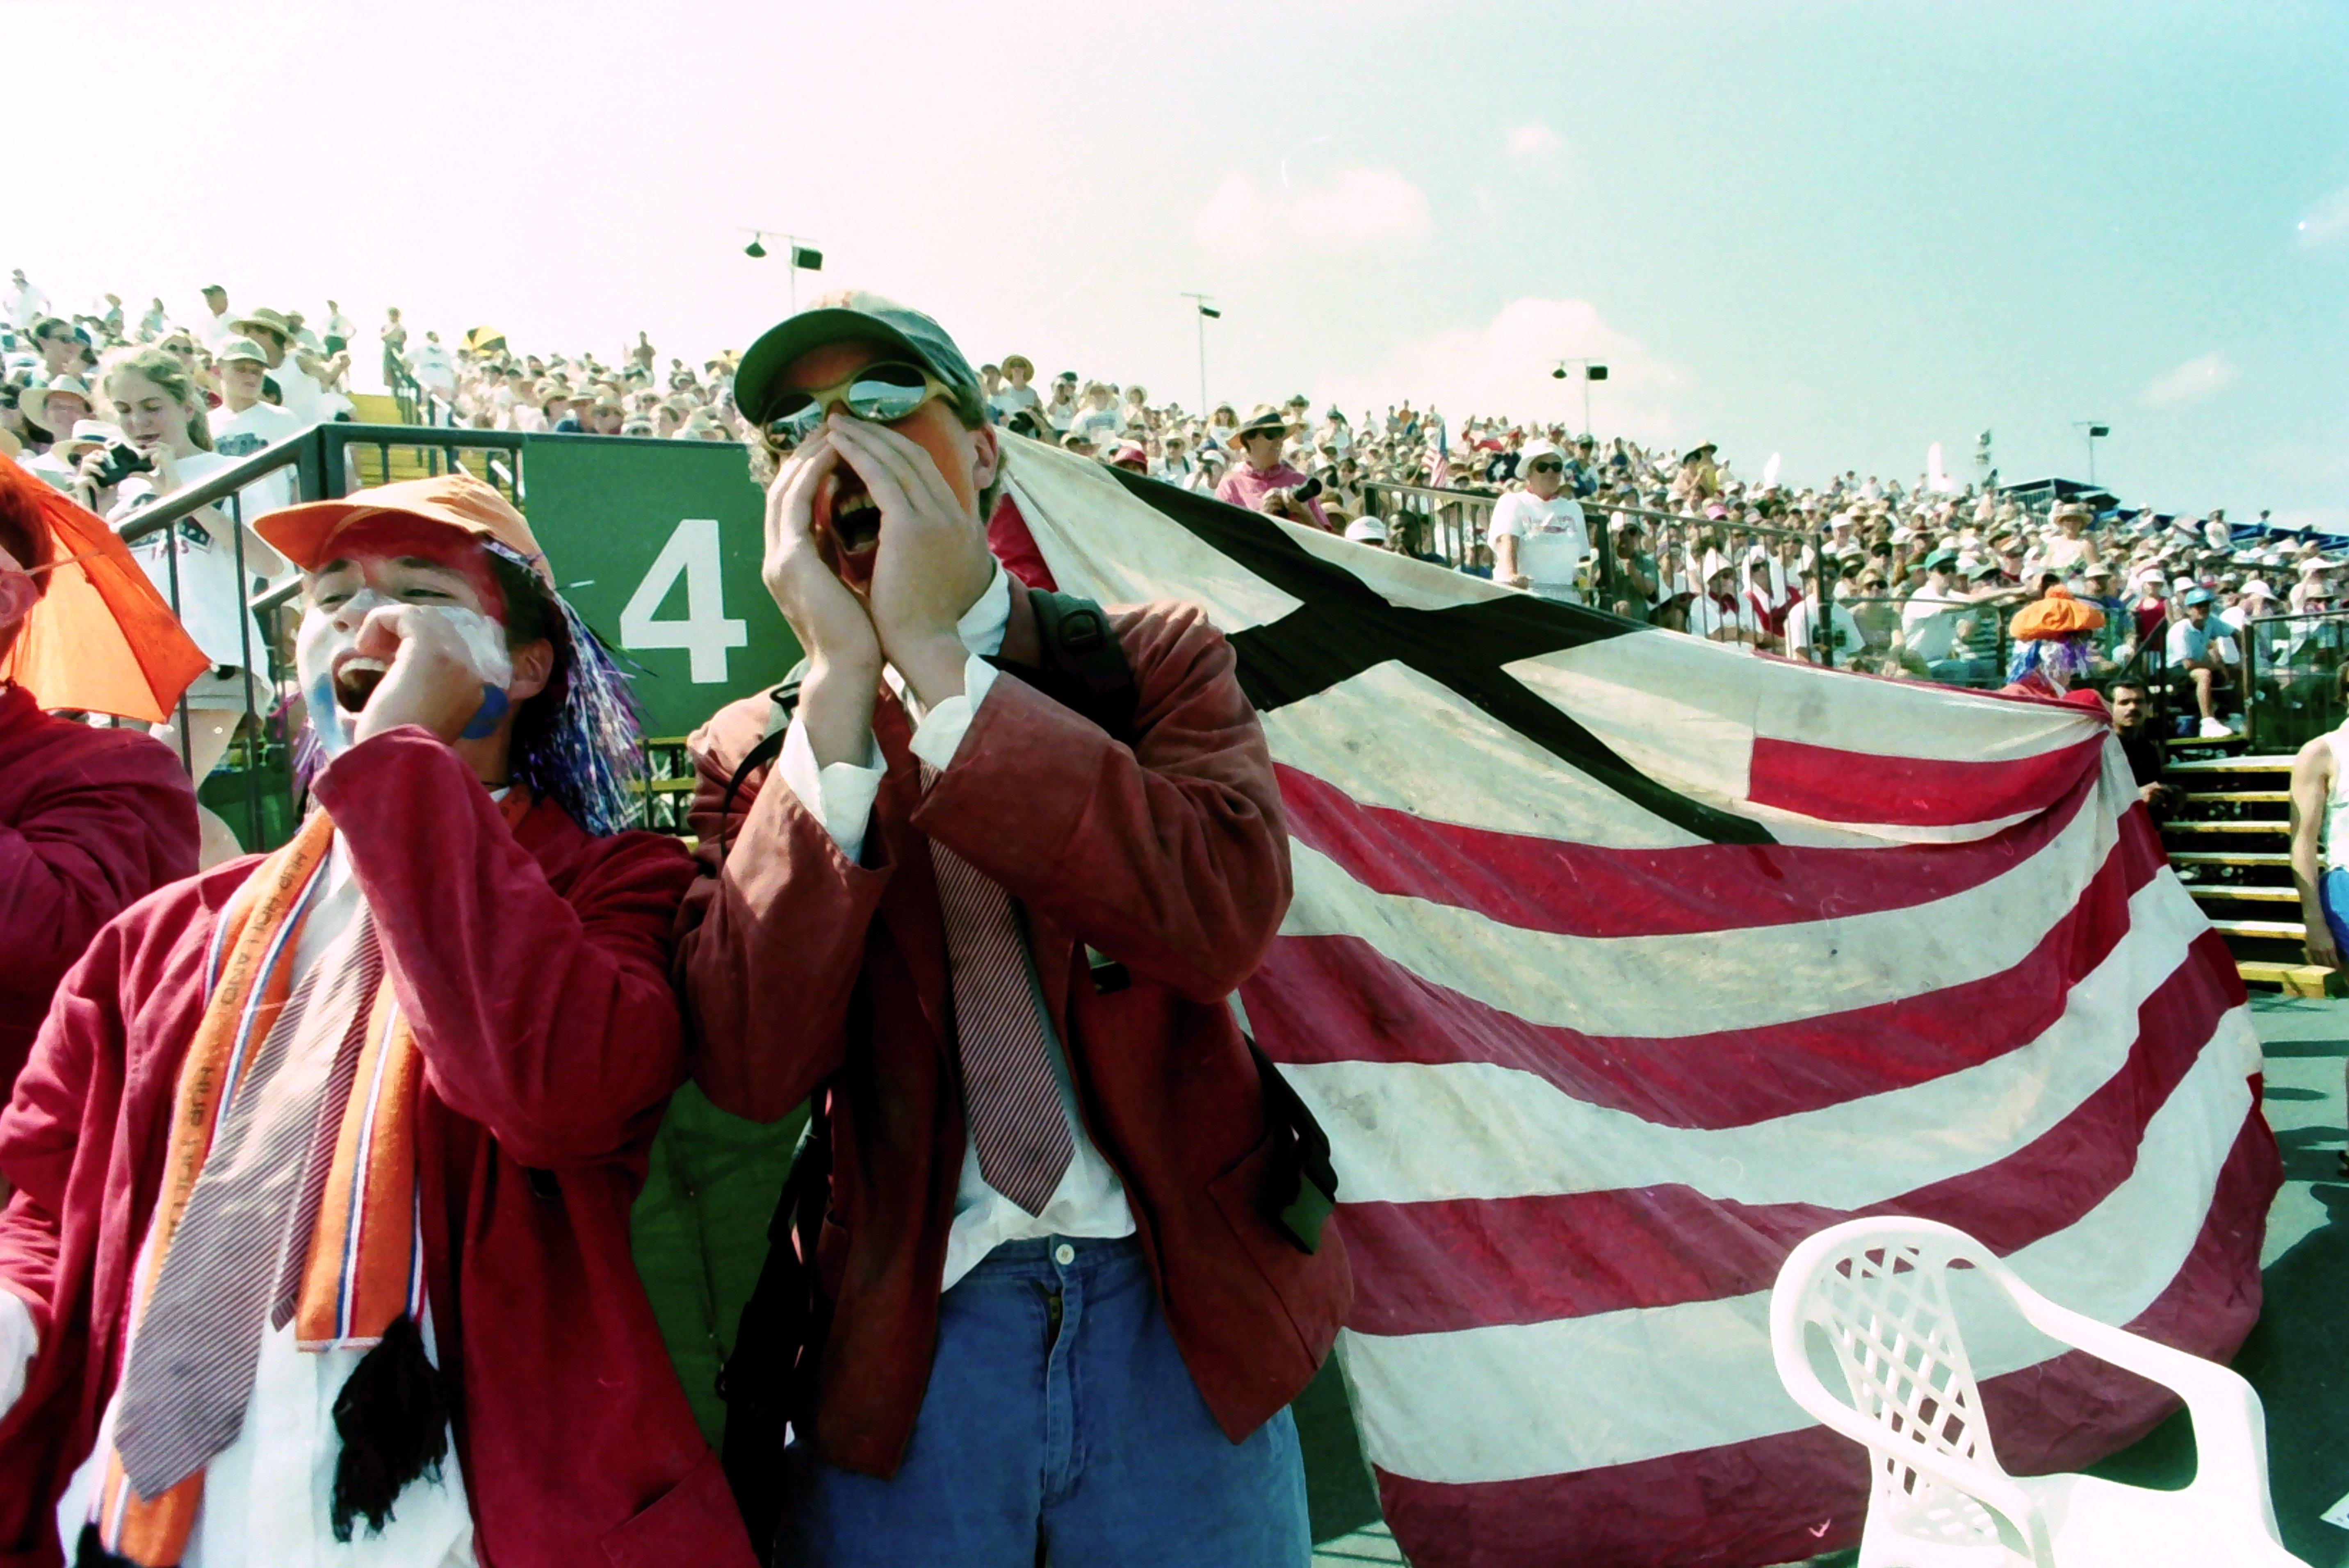 1996 crowd 6.jpg